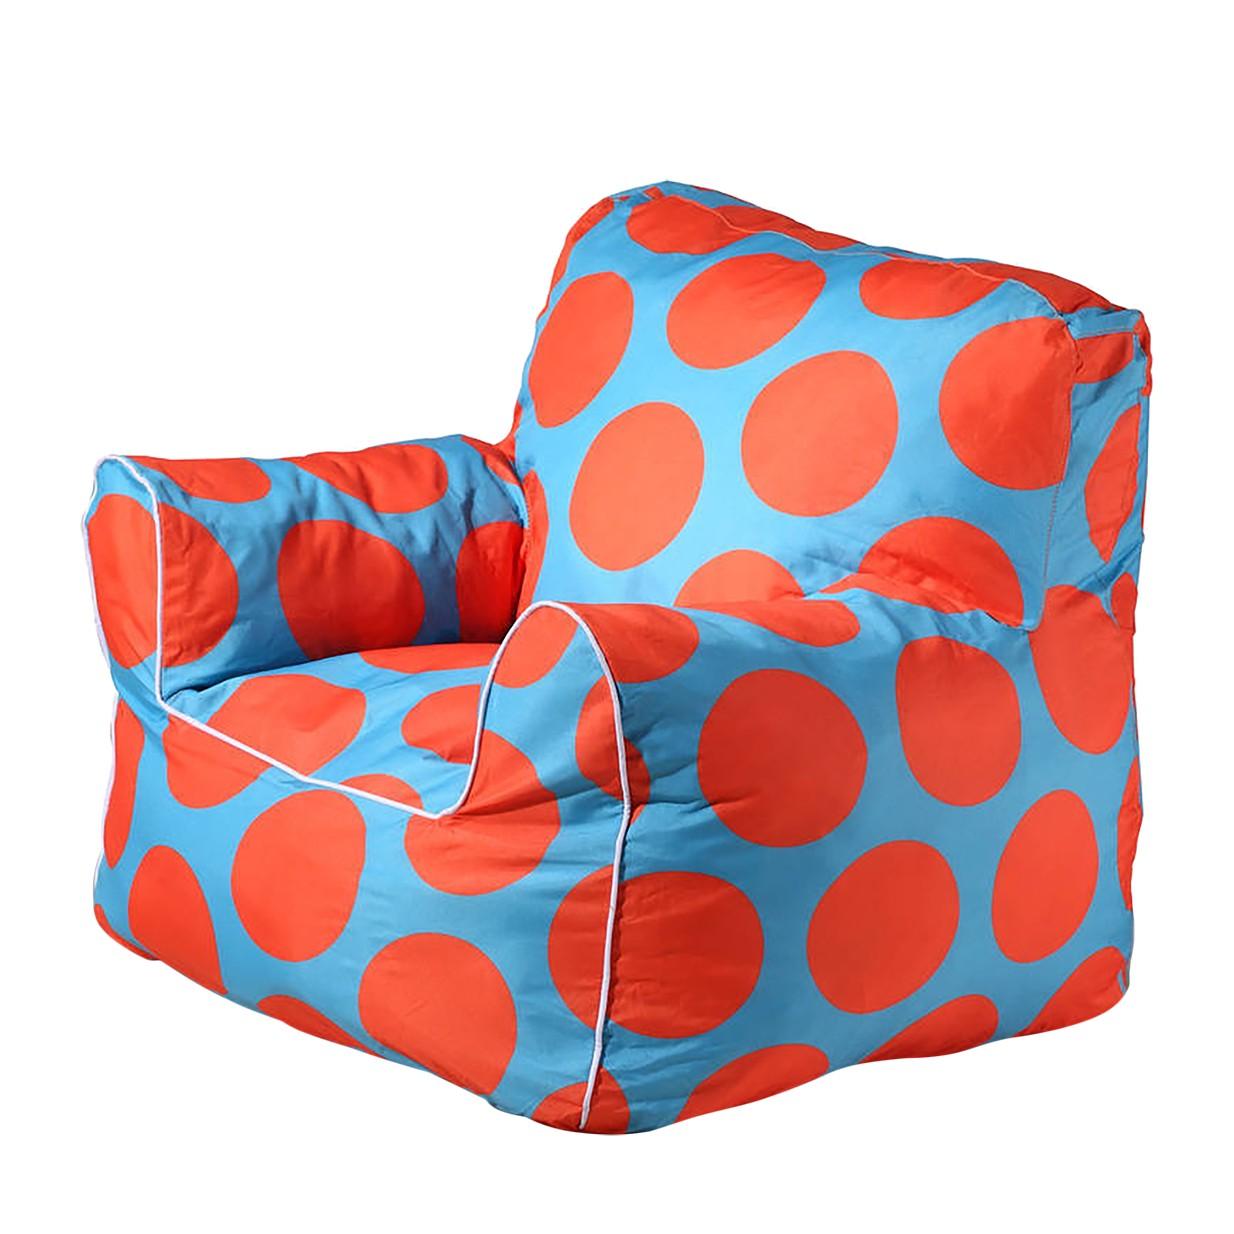 Kindersitzsack Lena Mini | Wohnzimmer > Sessel > Sitzsaecke | Blau | Textil | Kayoom